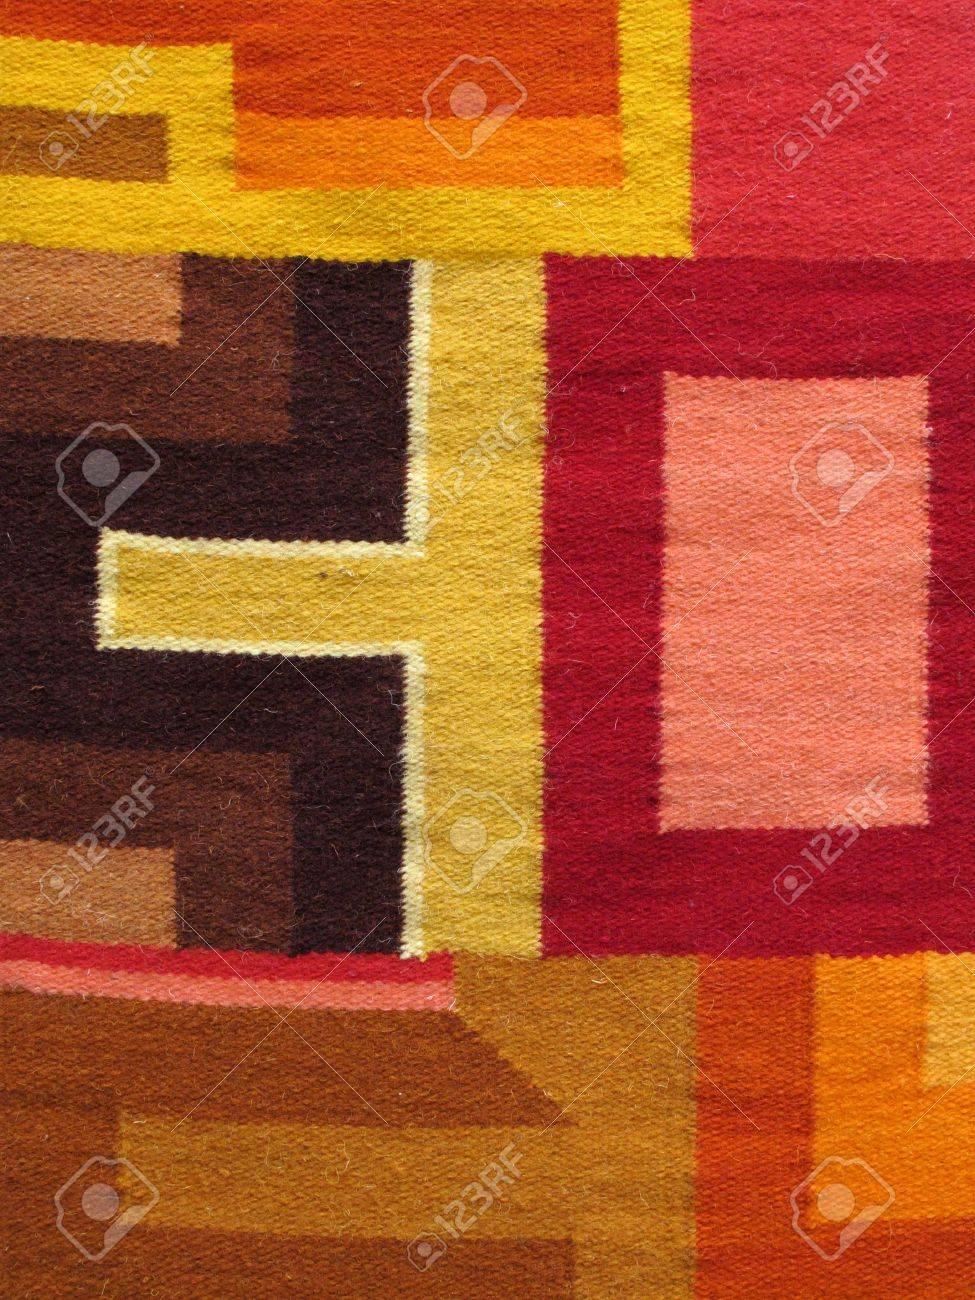 South America Indian woven fabrics Stock Photo - 11172069